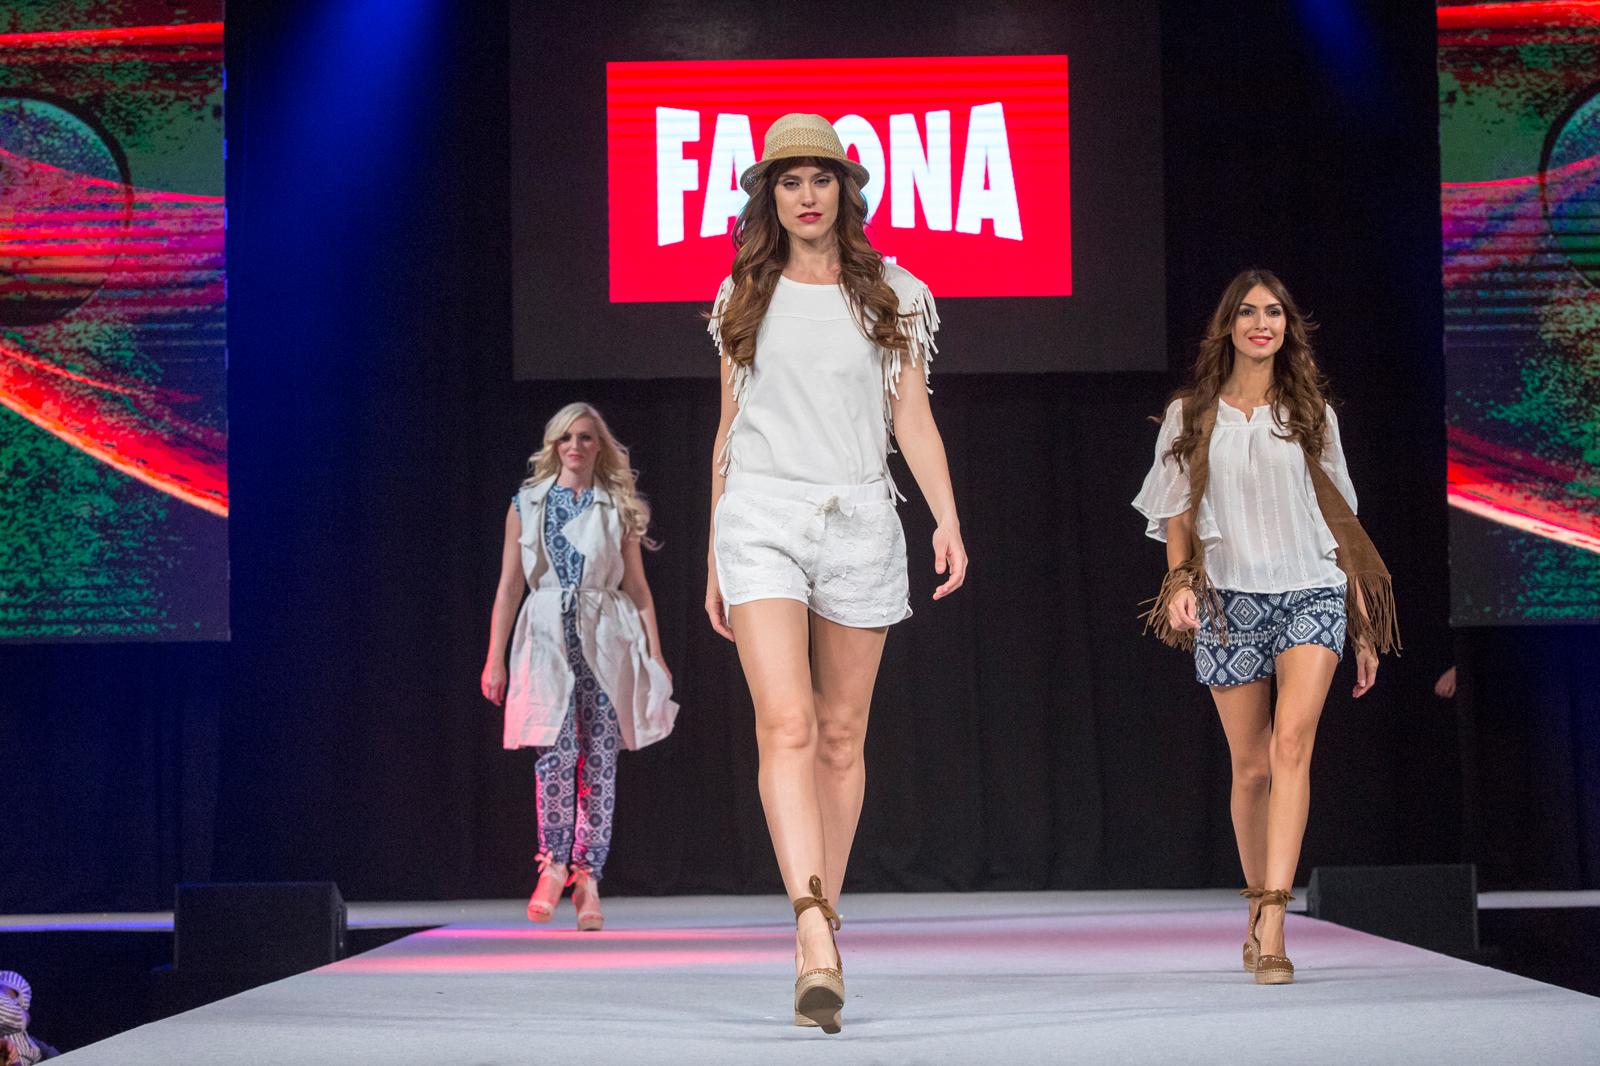 Facona (4)